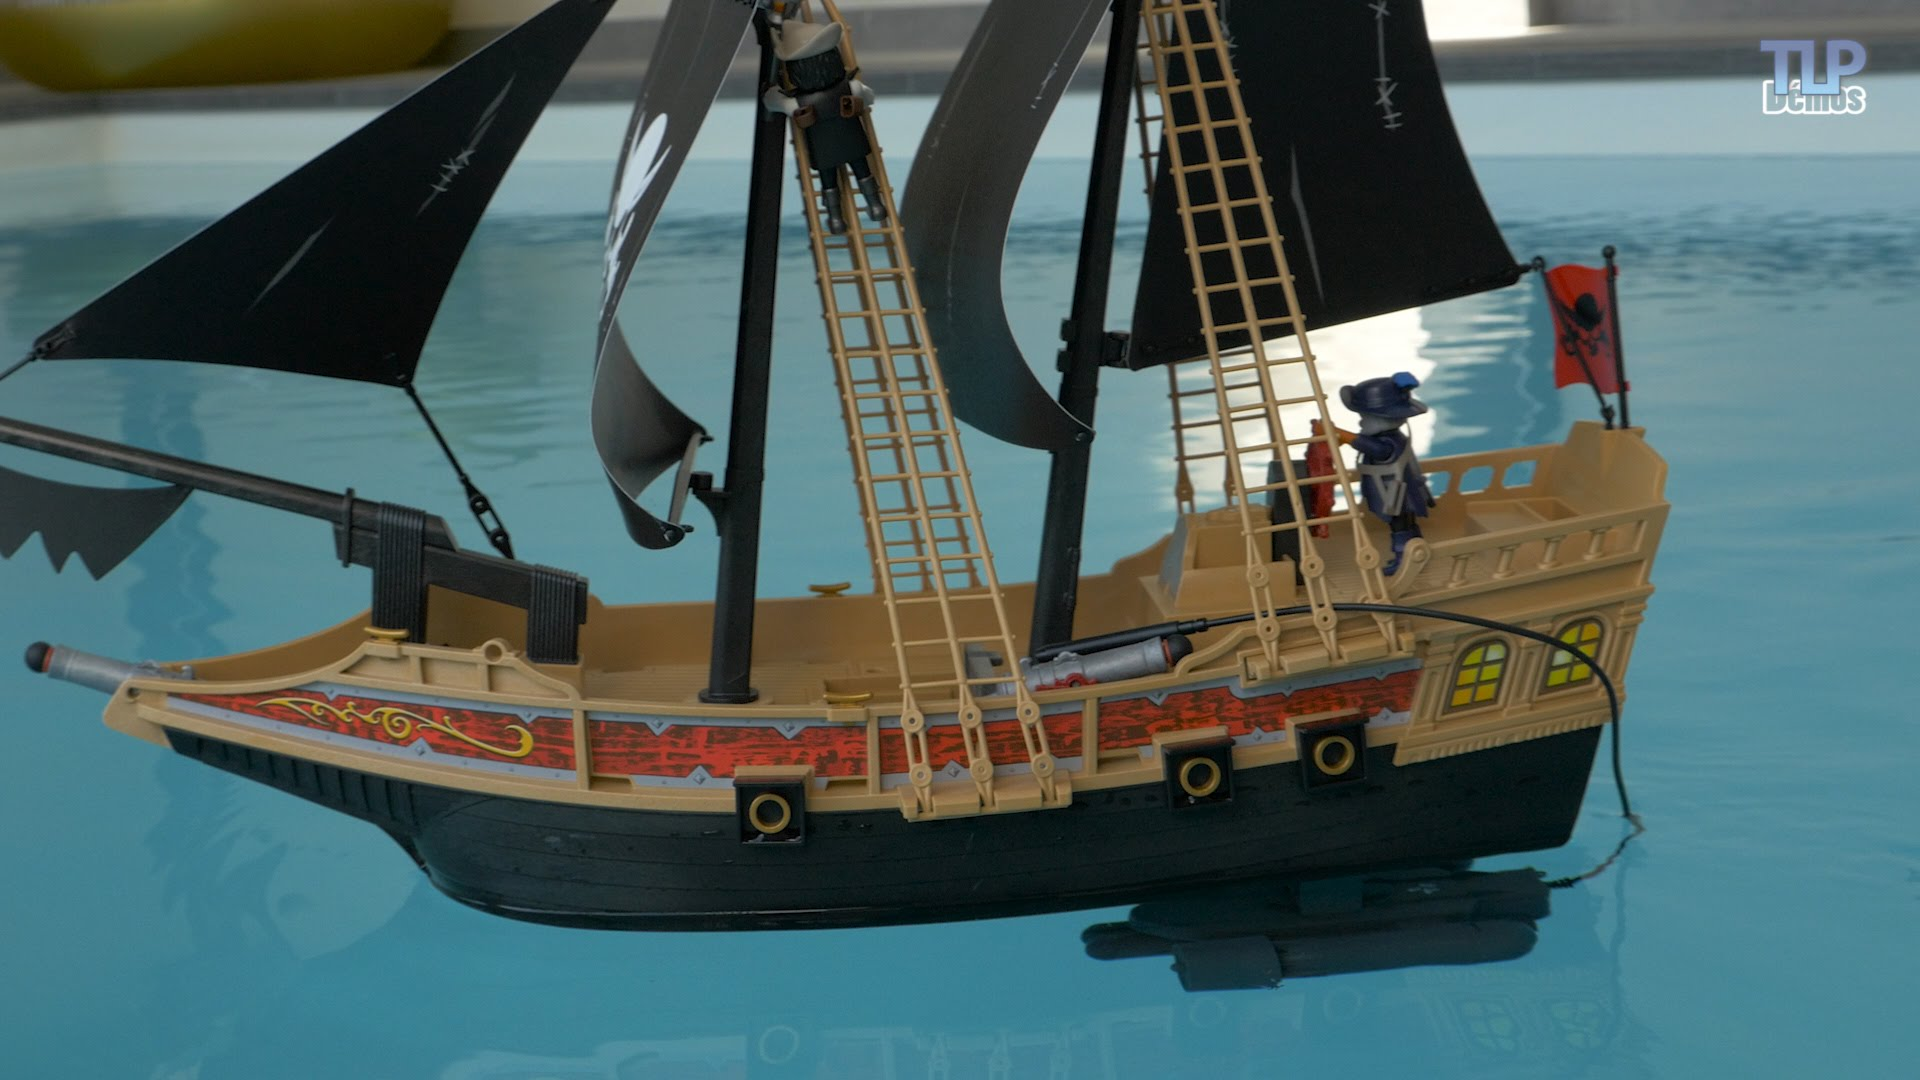 Bateau pirate playmobil photo